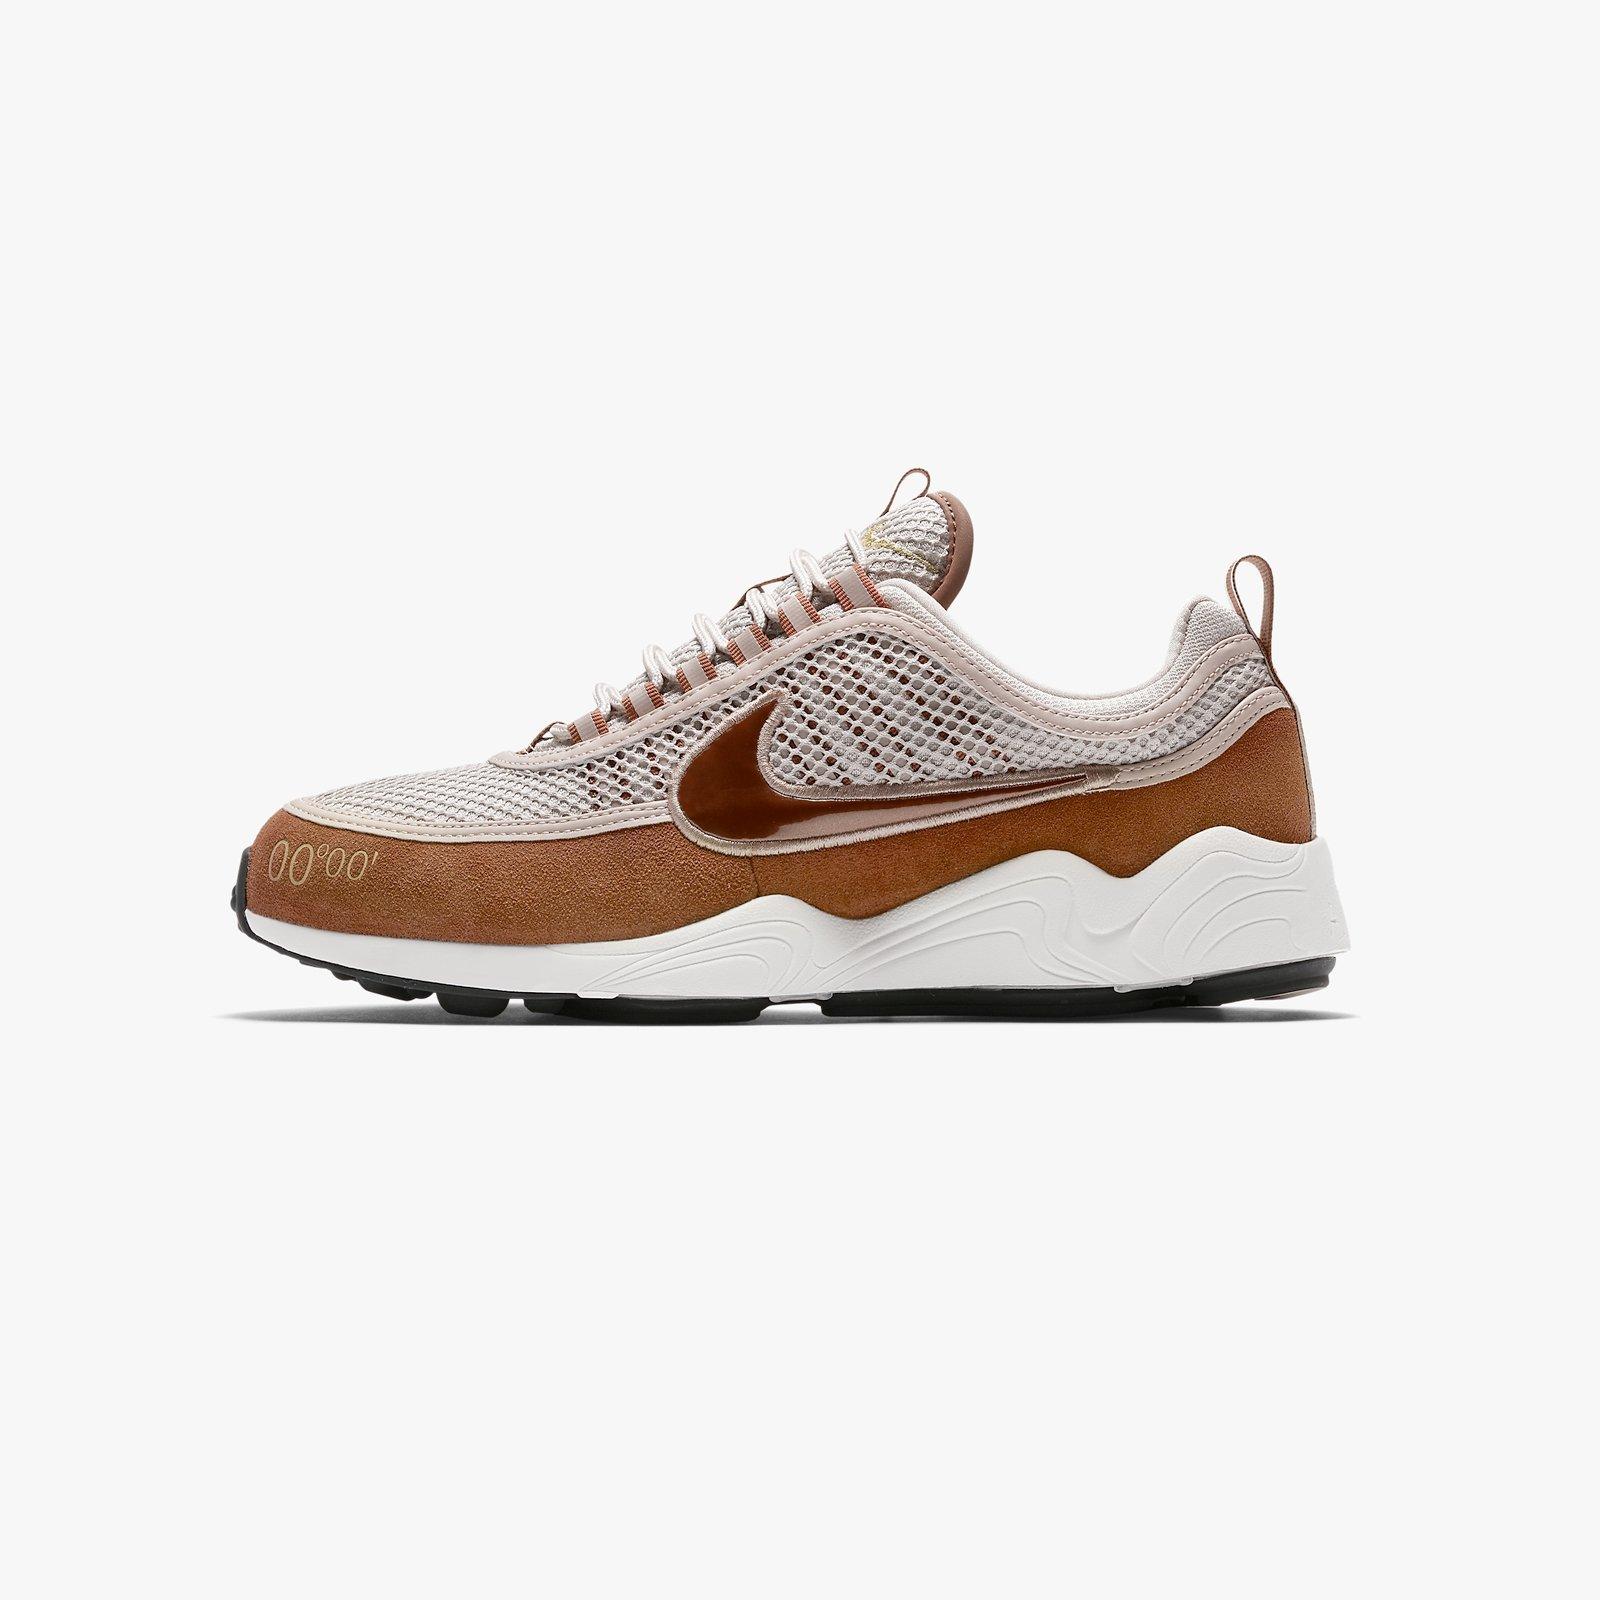 newest 19f8a 50f05 ... Nike Sportswear Air Zoom Spiridon UK ...